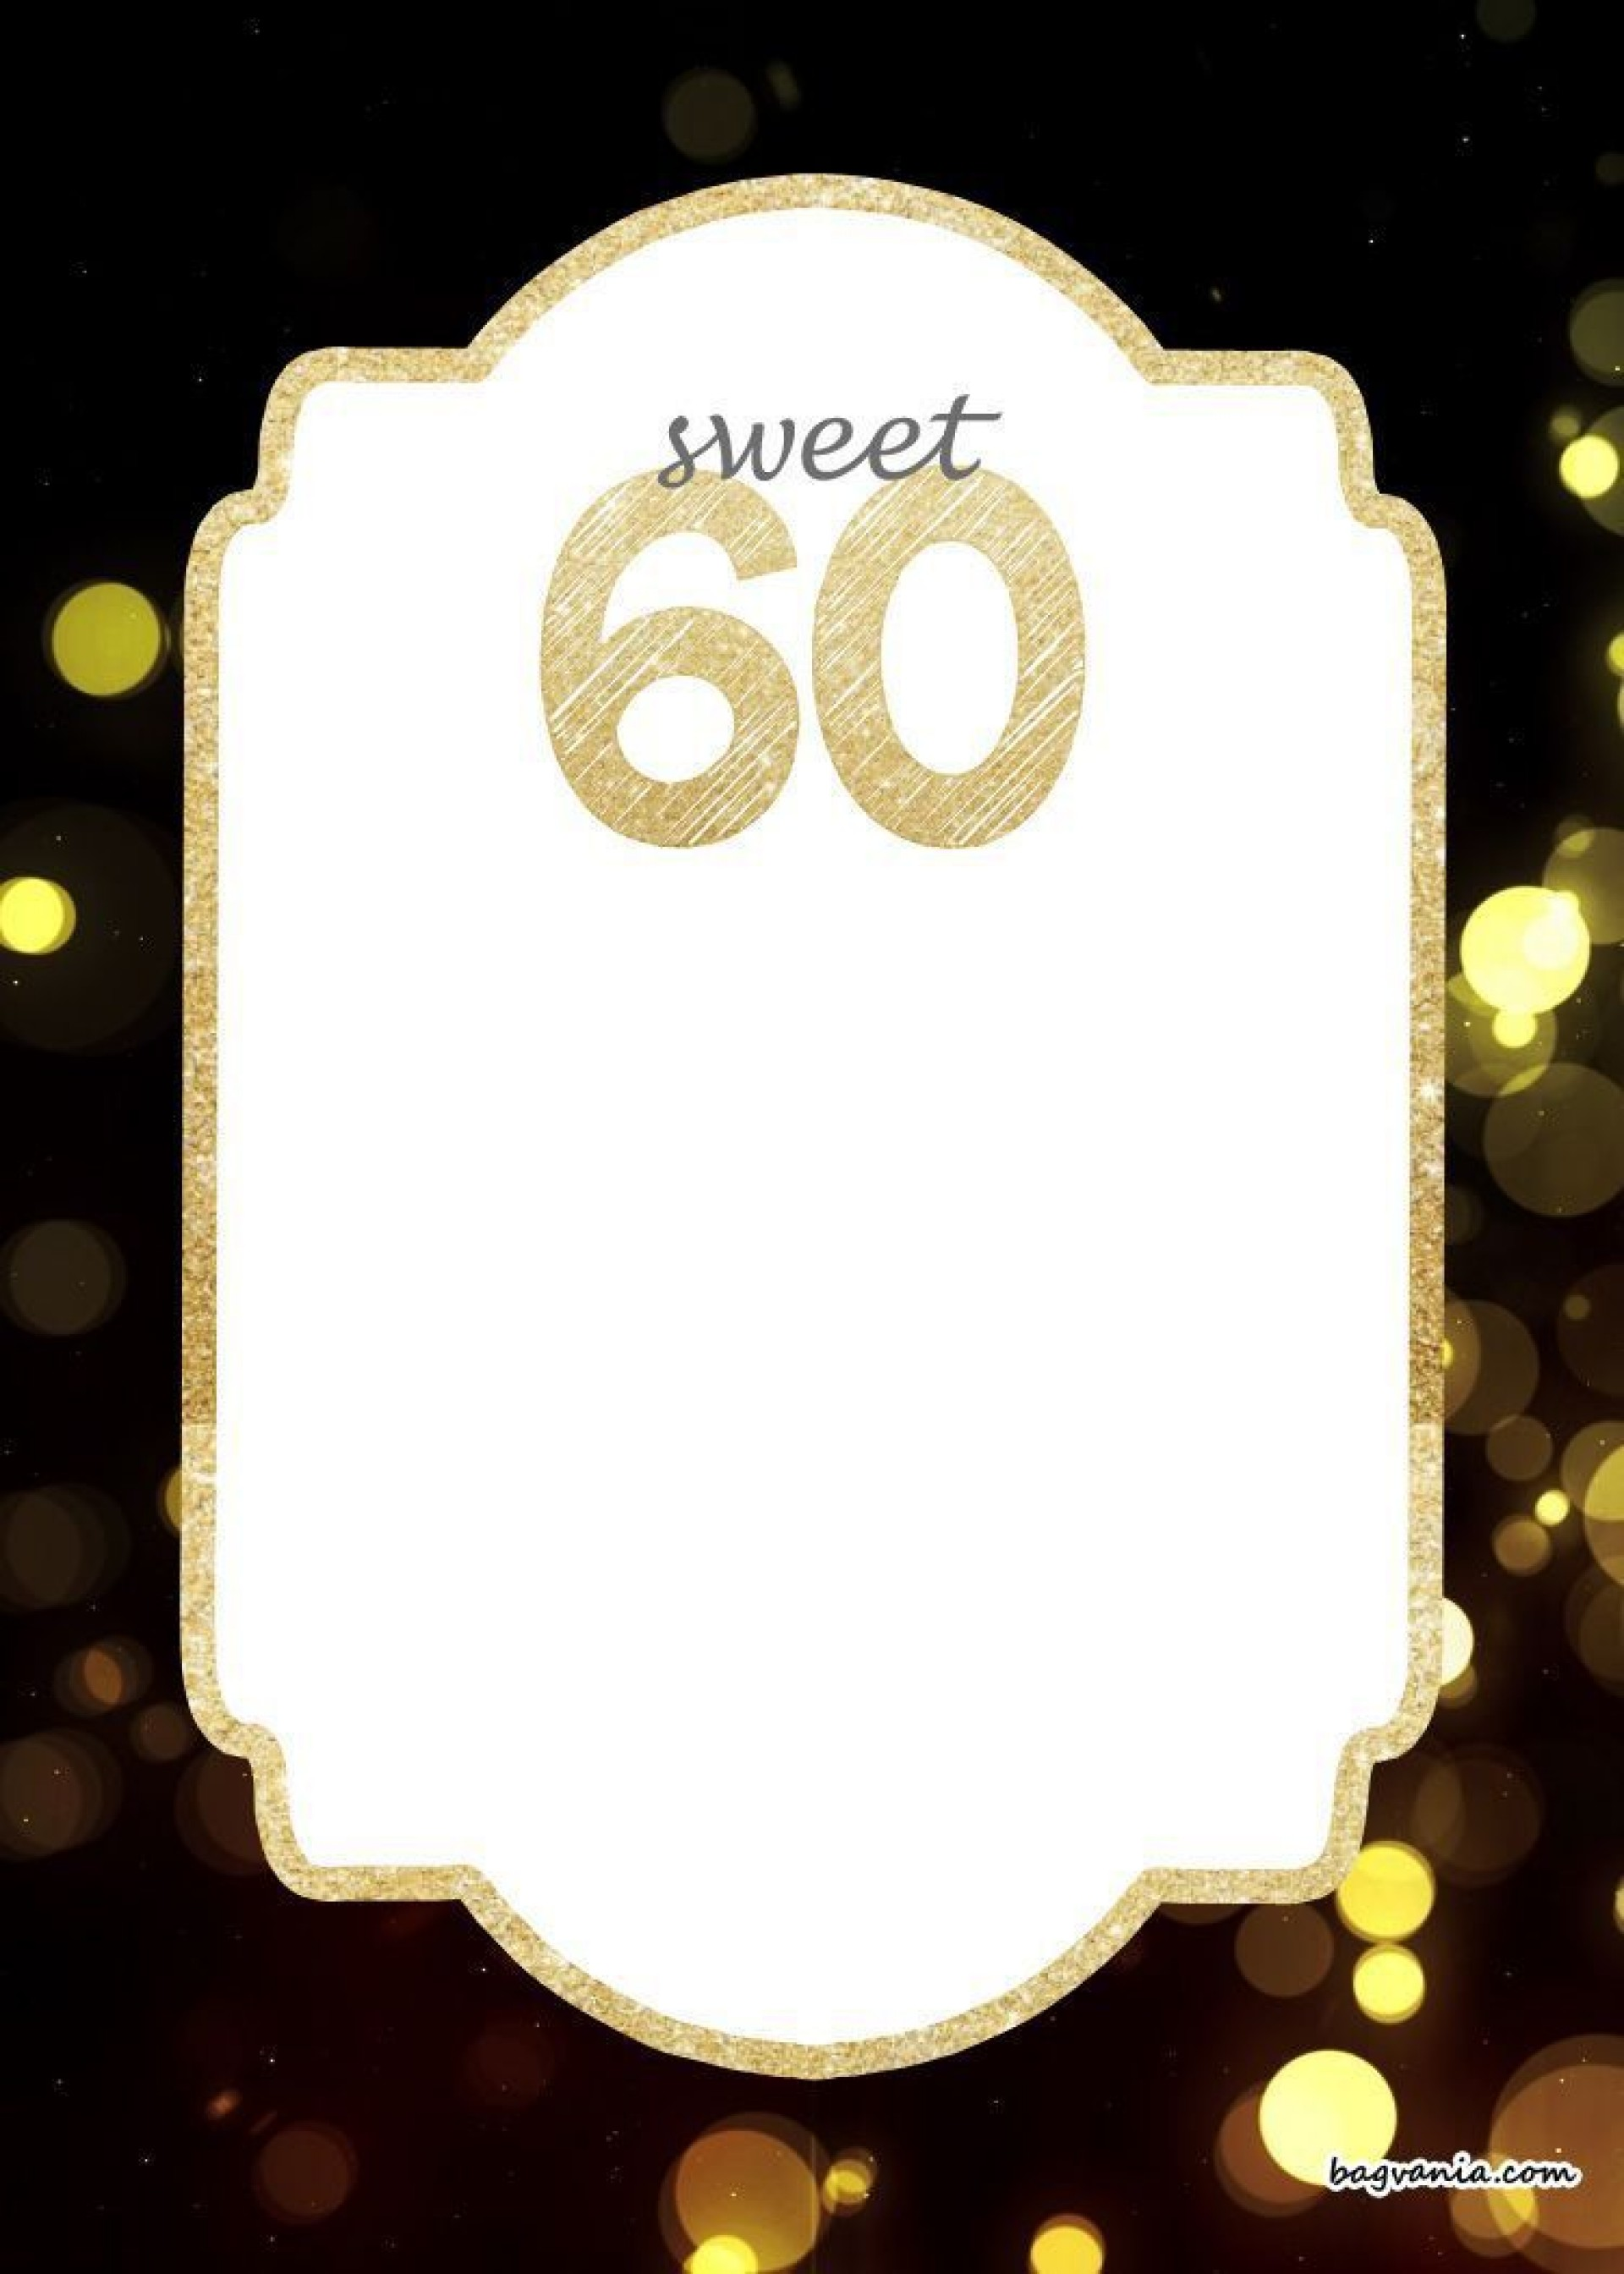 005 Unusual 60 Birthday Invite Template Inspiration  Templates 60th Printable Free1920